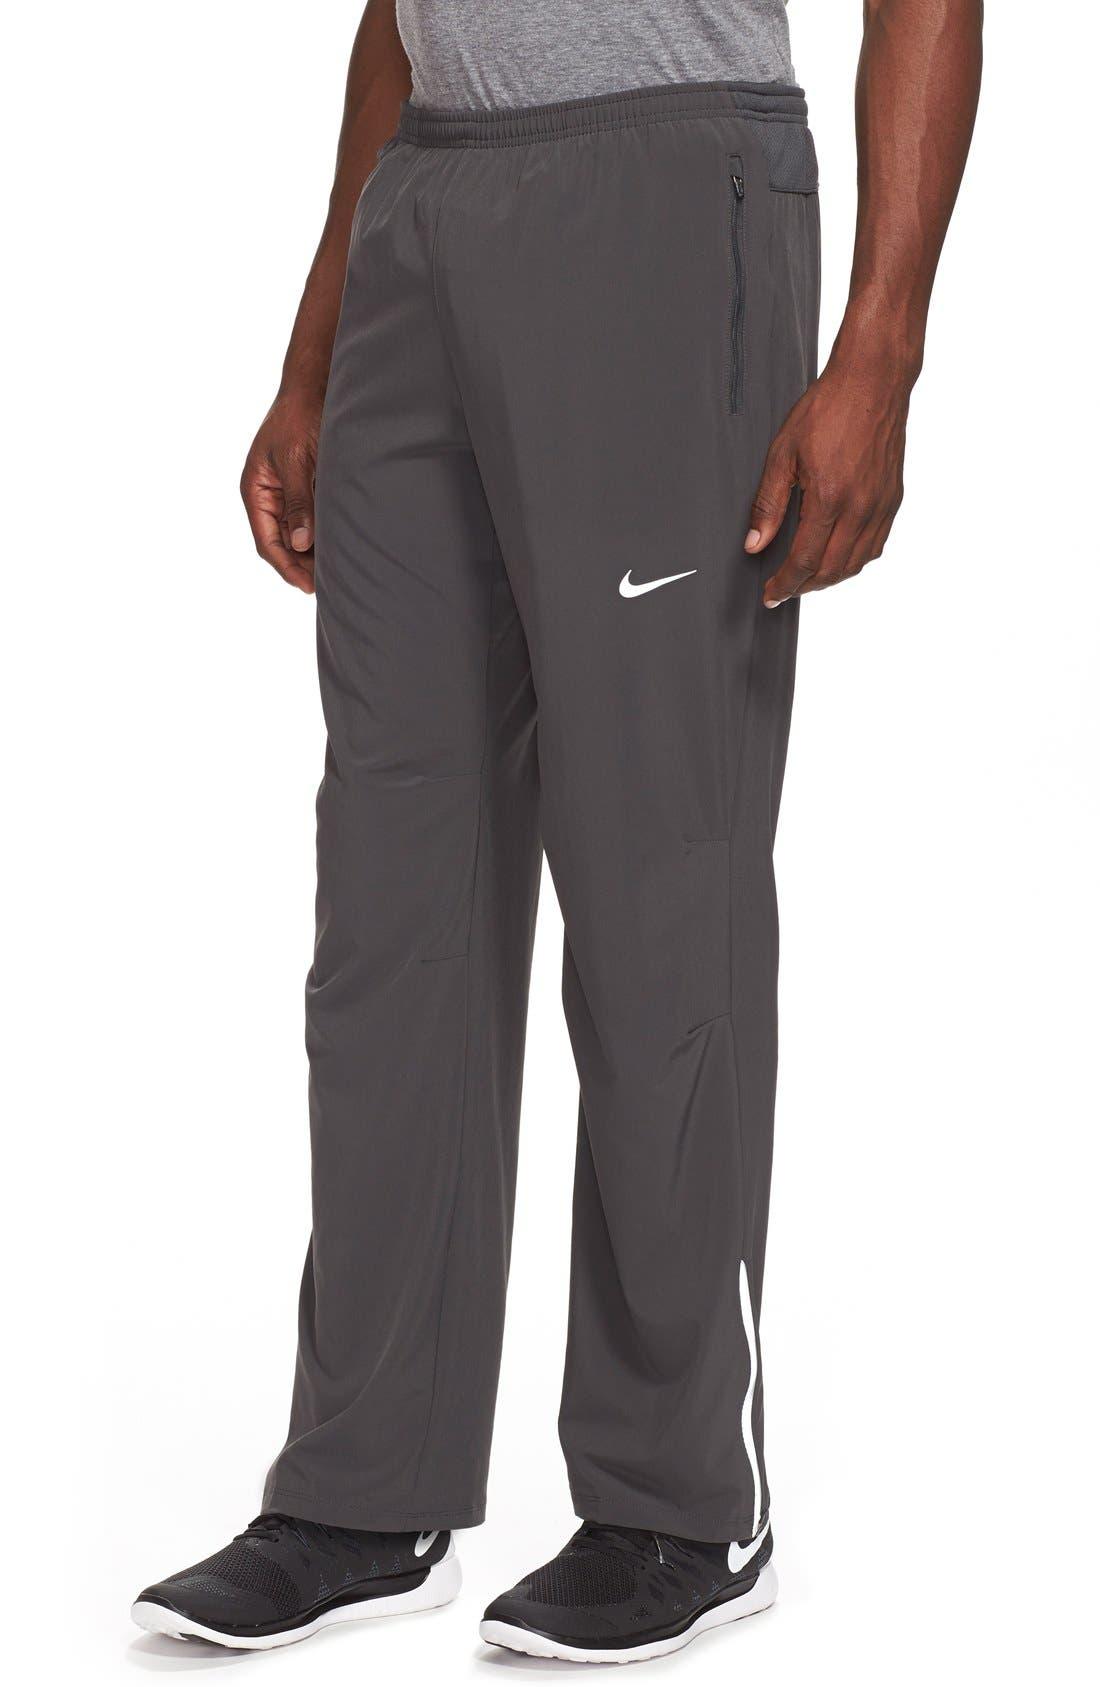 Nike Dri-FIT Woven Pants